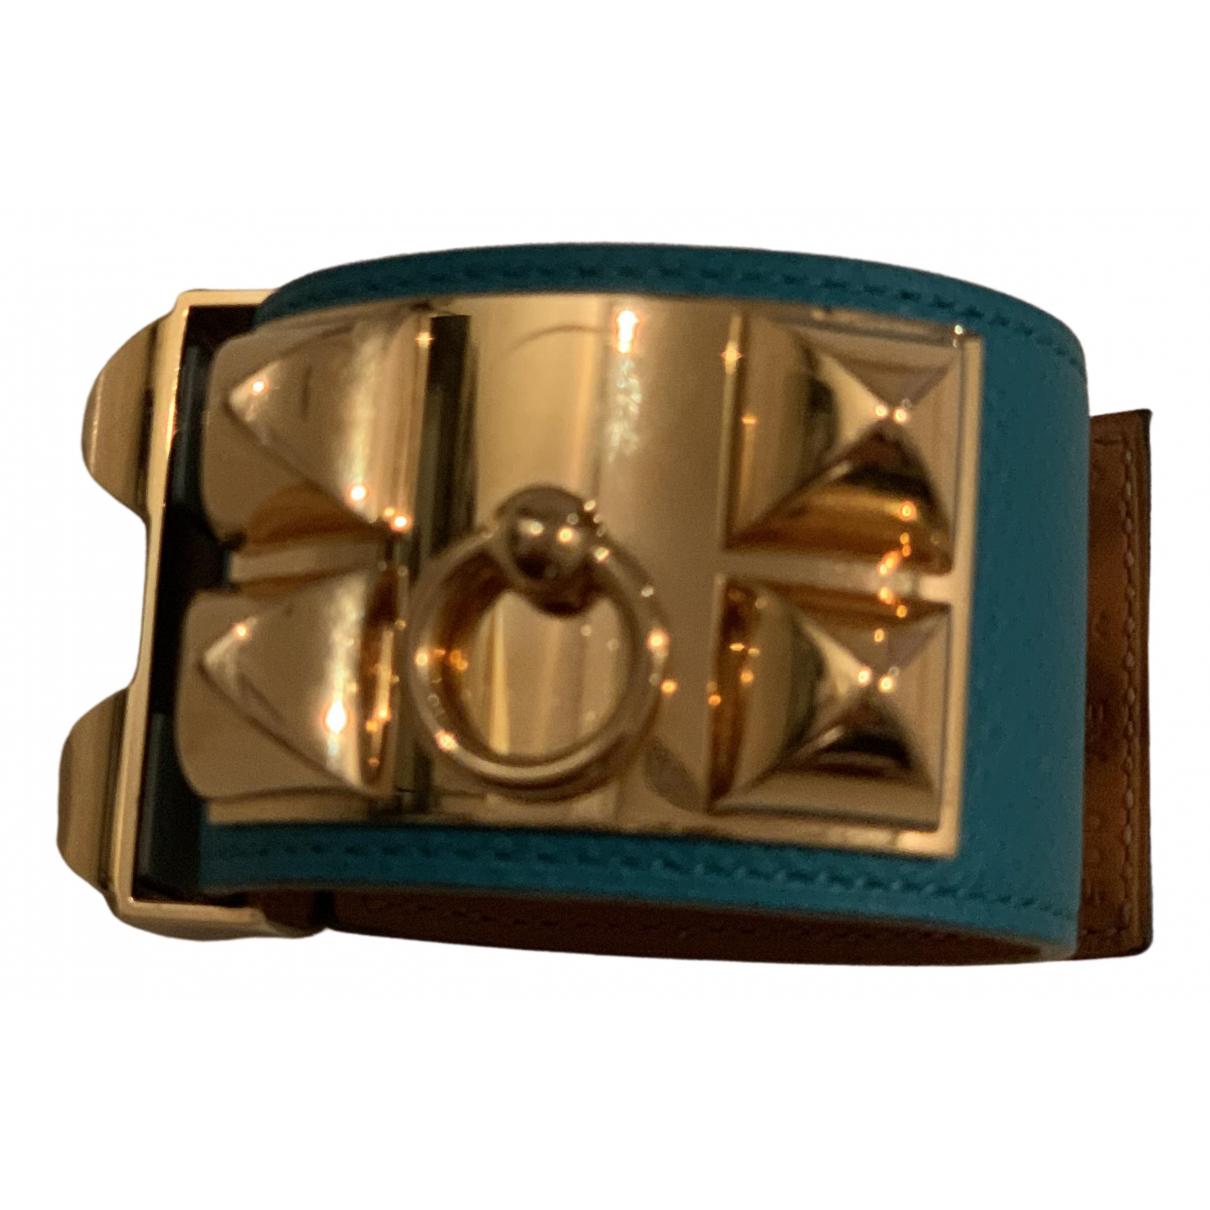 Hermes Chaine dAncre Armband in  Tuerkis Leder